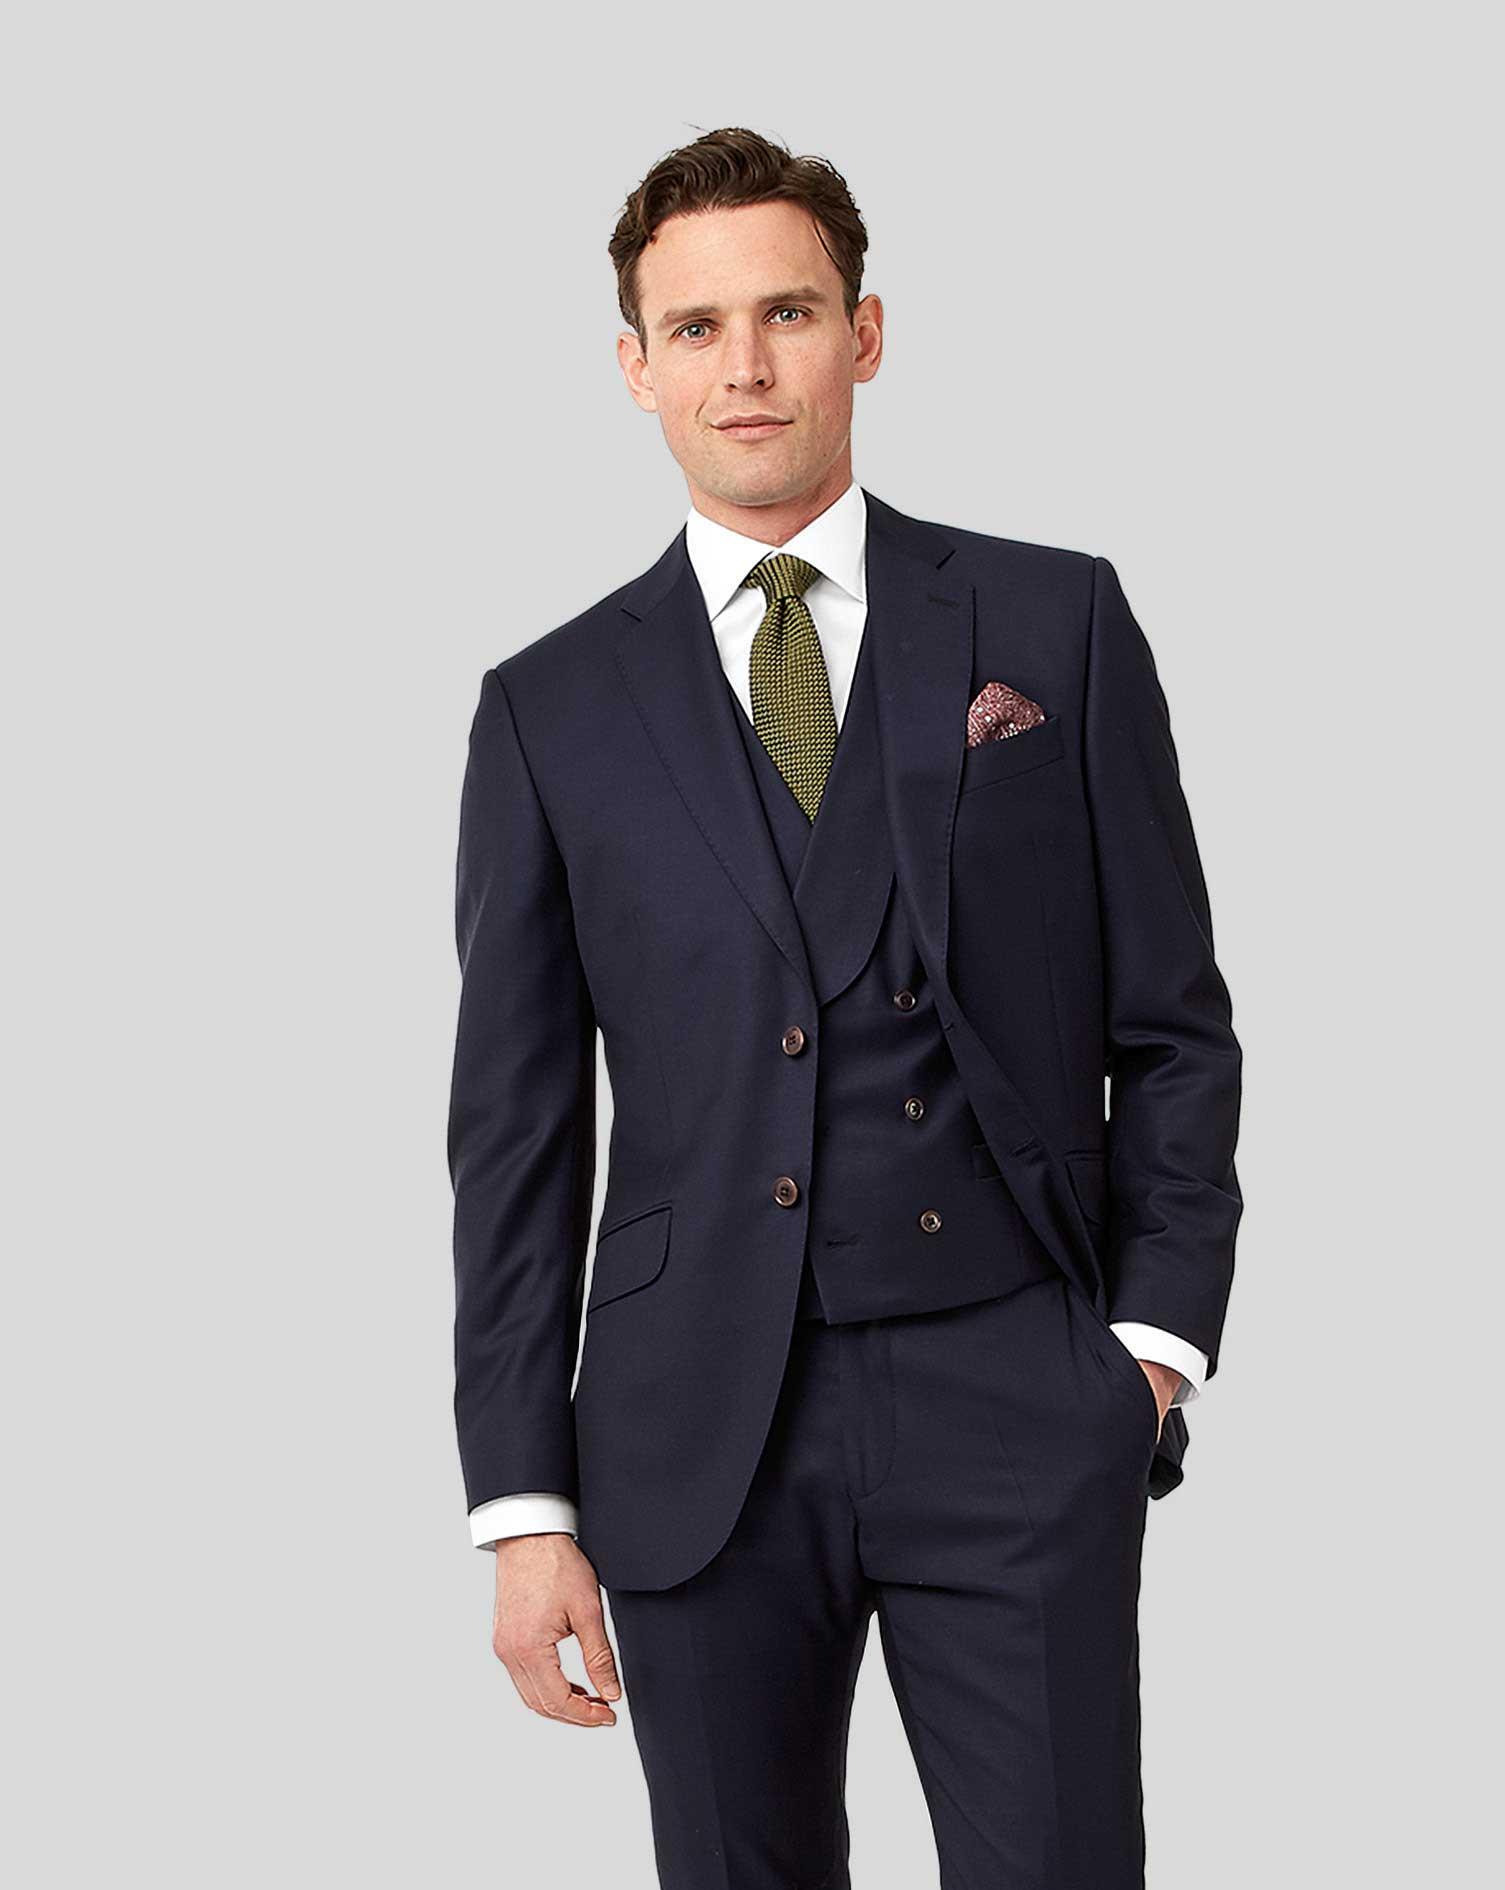 Navy Slim Fit Twill Italian Luxury Suit Wool Jacket Size 46 Regular by Charles Tyrwhitt